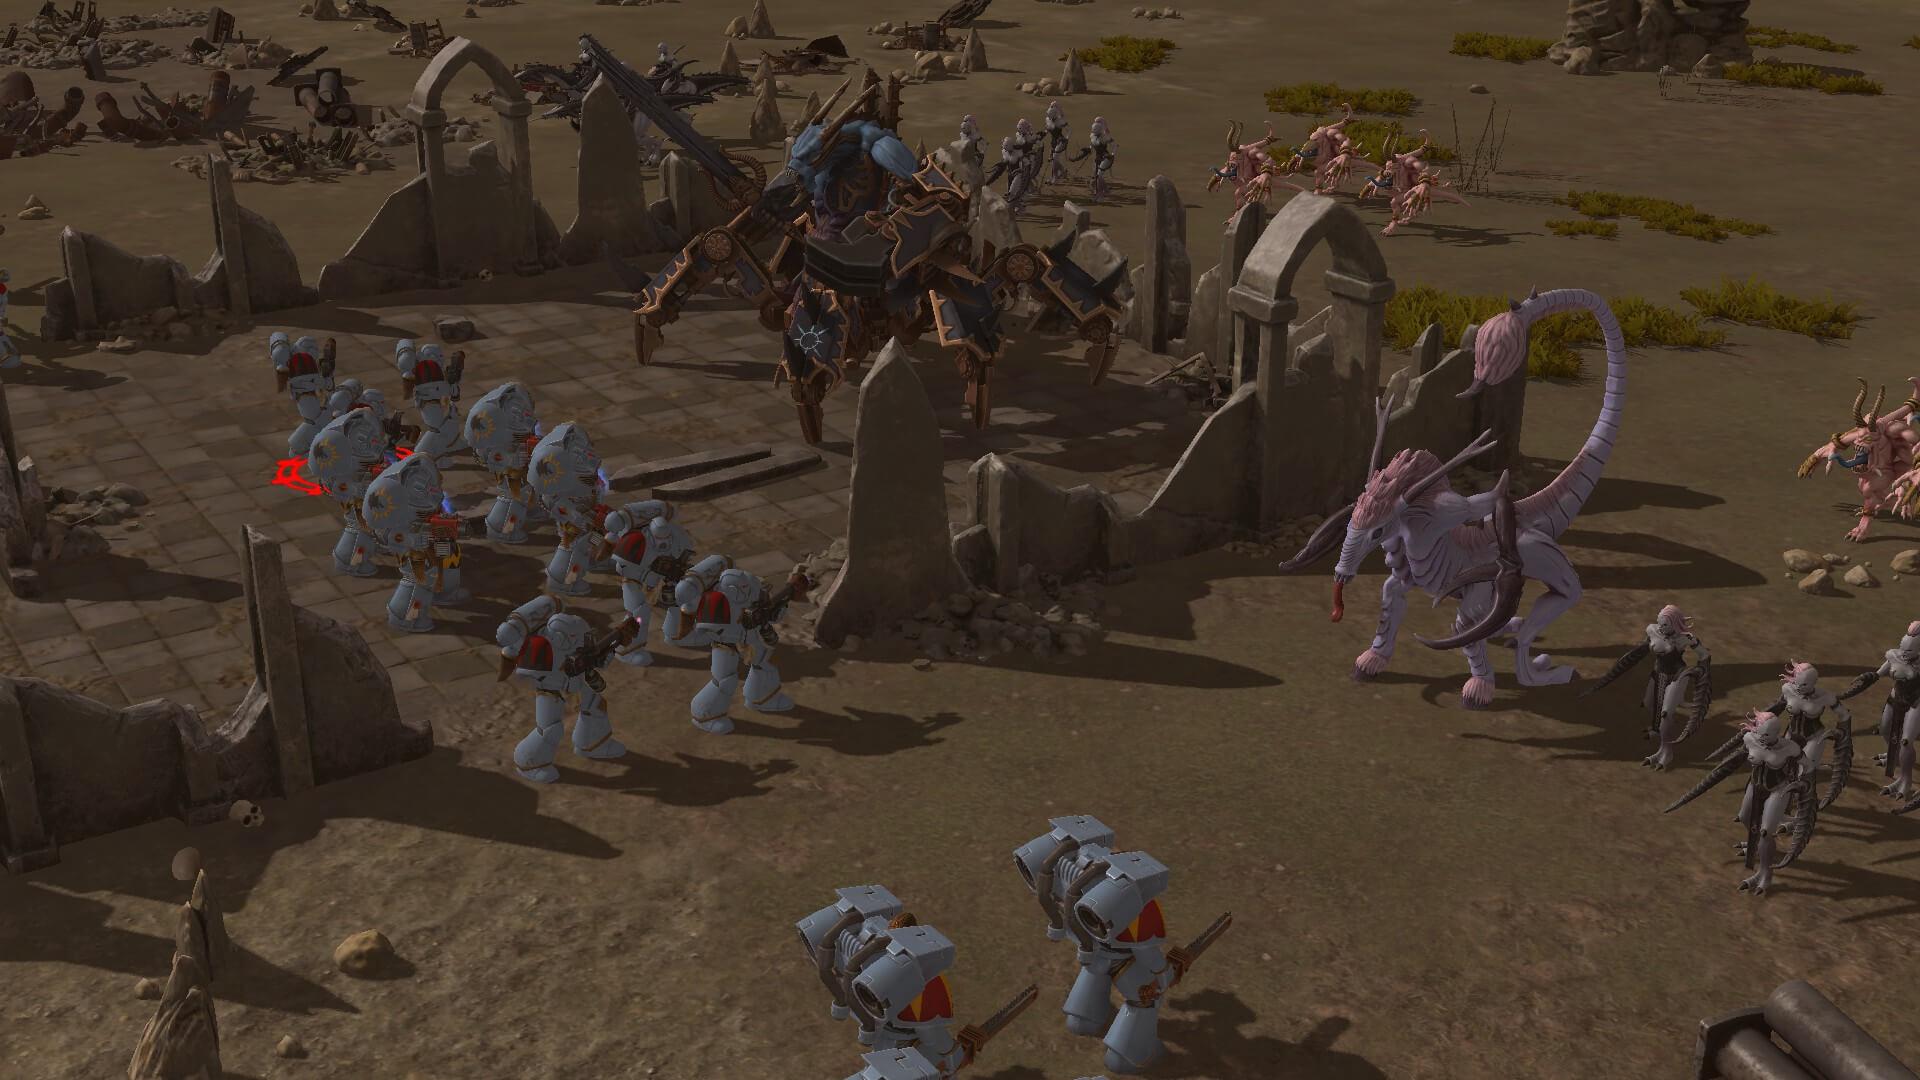 Warhammer 40000 Sanctus Reach Horrors Of The Warp Free